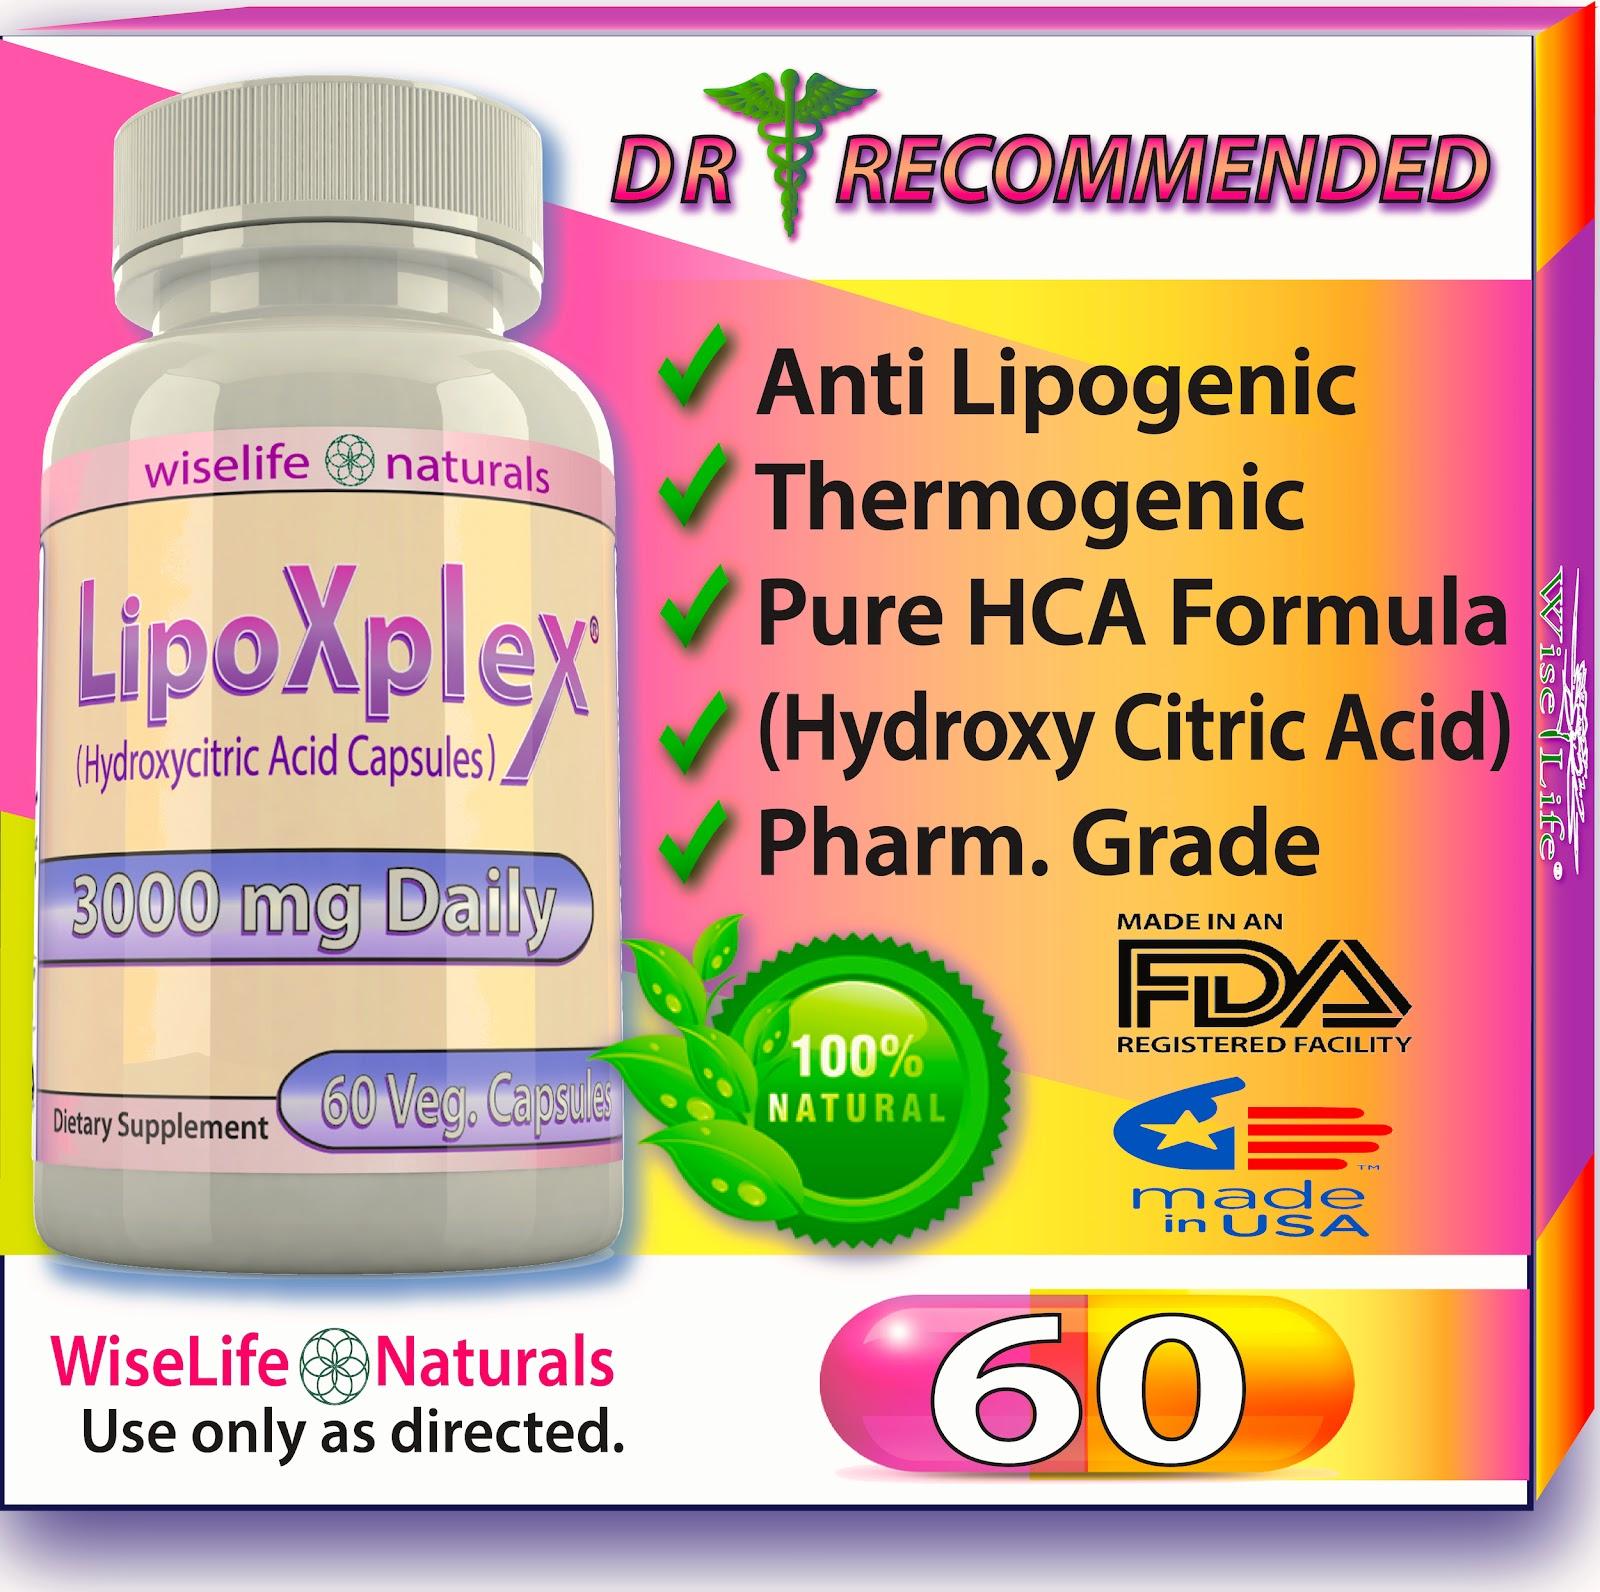 box ads wln LipoxPlex-60.jpg